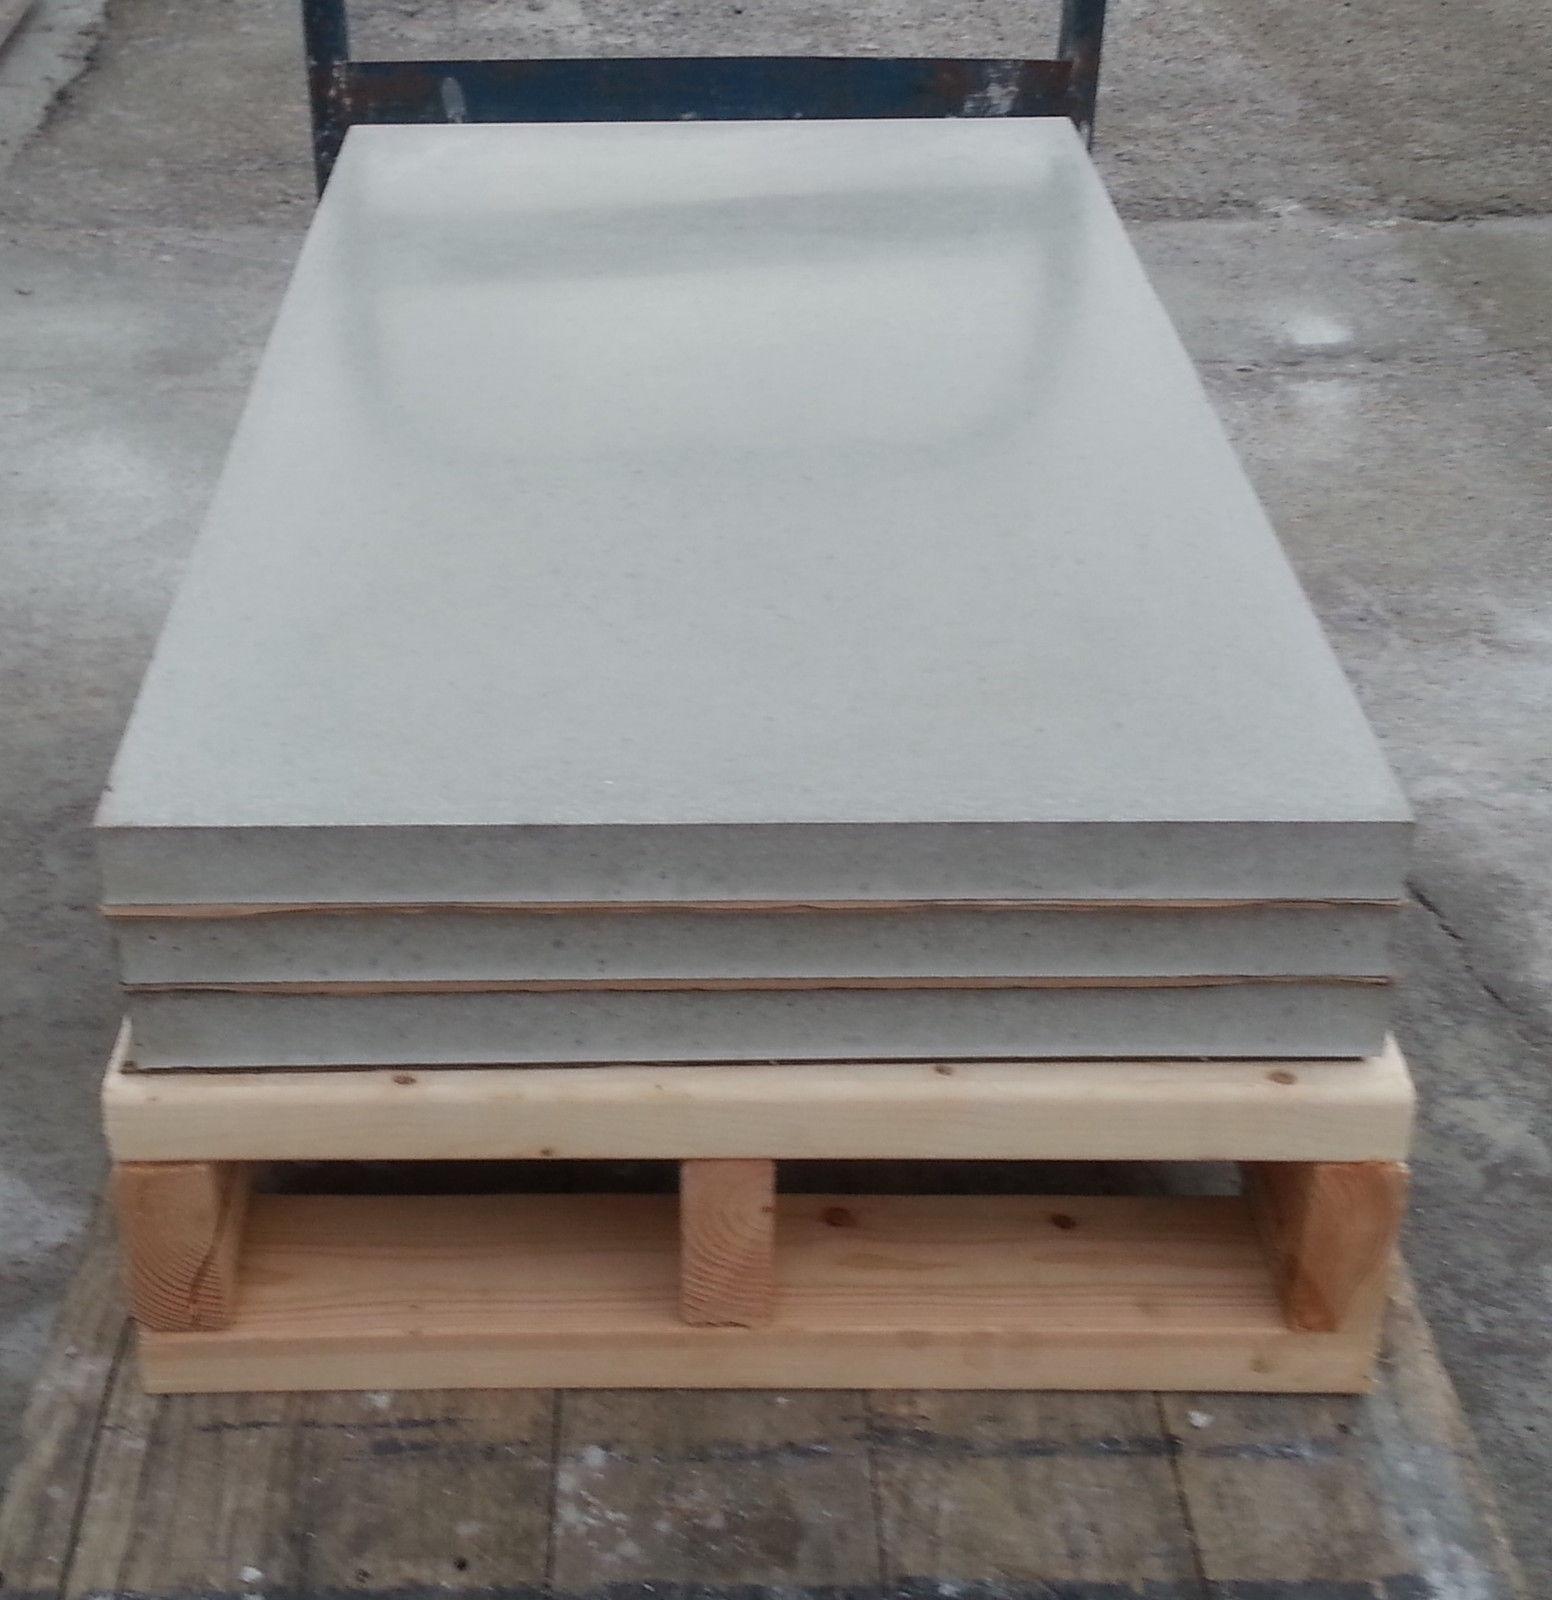 Baking Deck Stones Nsf For Bakers Pride Y 600 Y 602 Pizza